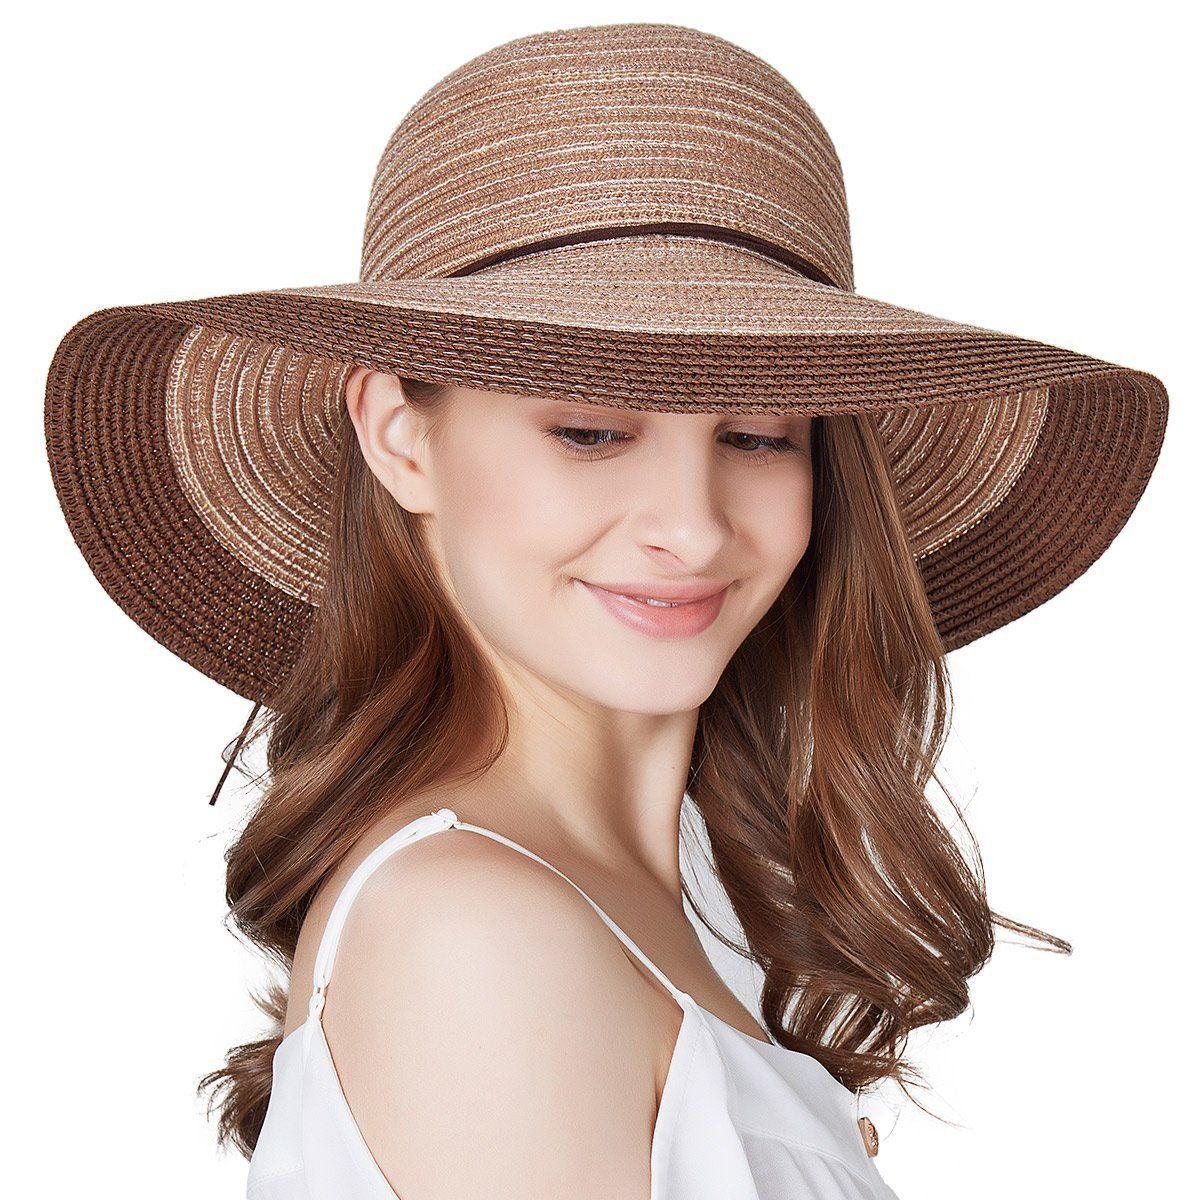 722de8b2 SOMALER Women Floppy Sun Hat Summer Wide Brim Beach Cap Packable Cotton Straw  Hat For Travel (Pink) at Amazon Women's Clothing store: